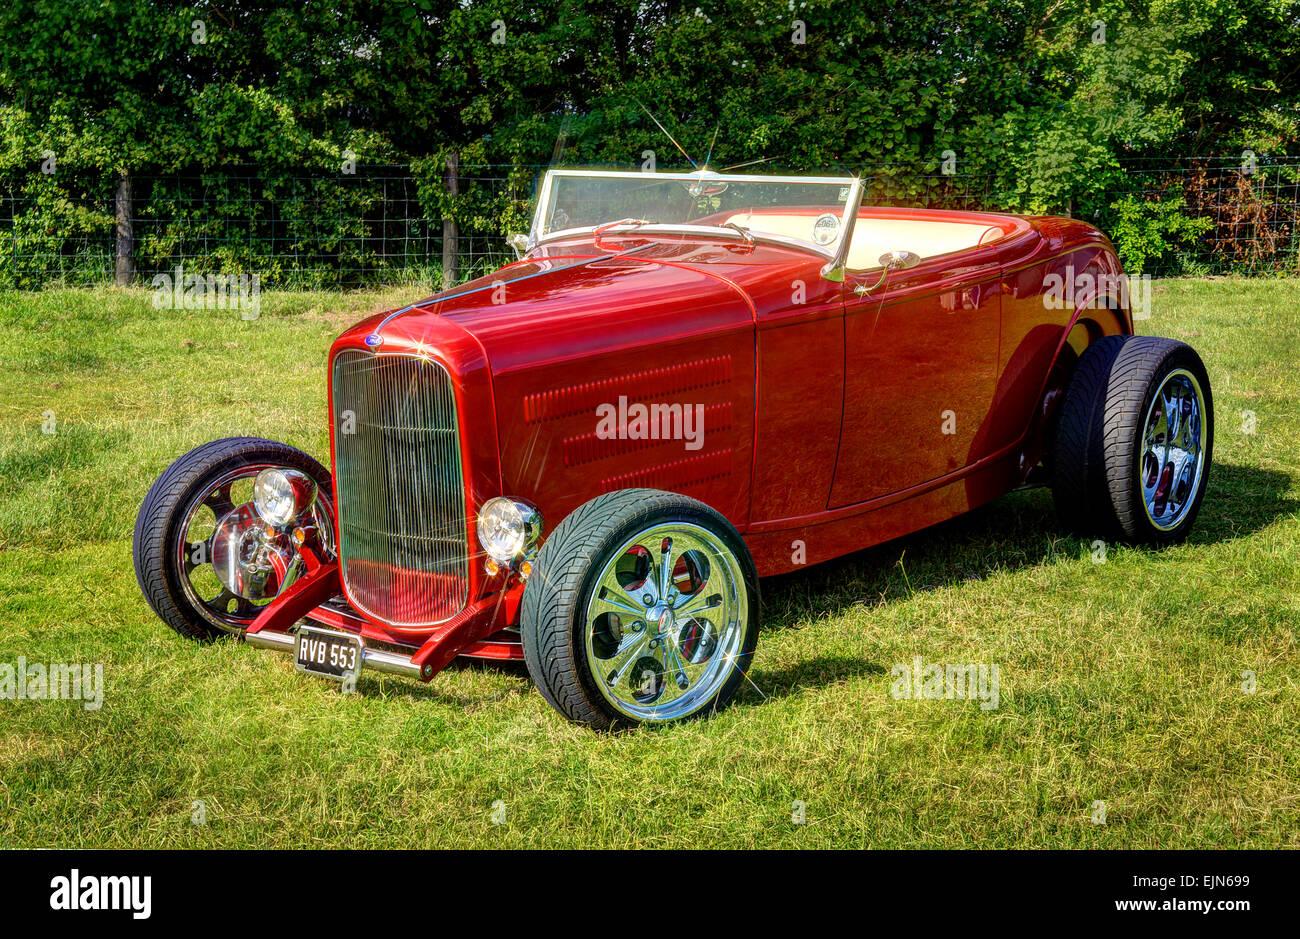 Ford Model B Roadster Hot Rod Stock Photo Alamy